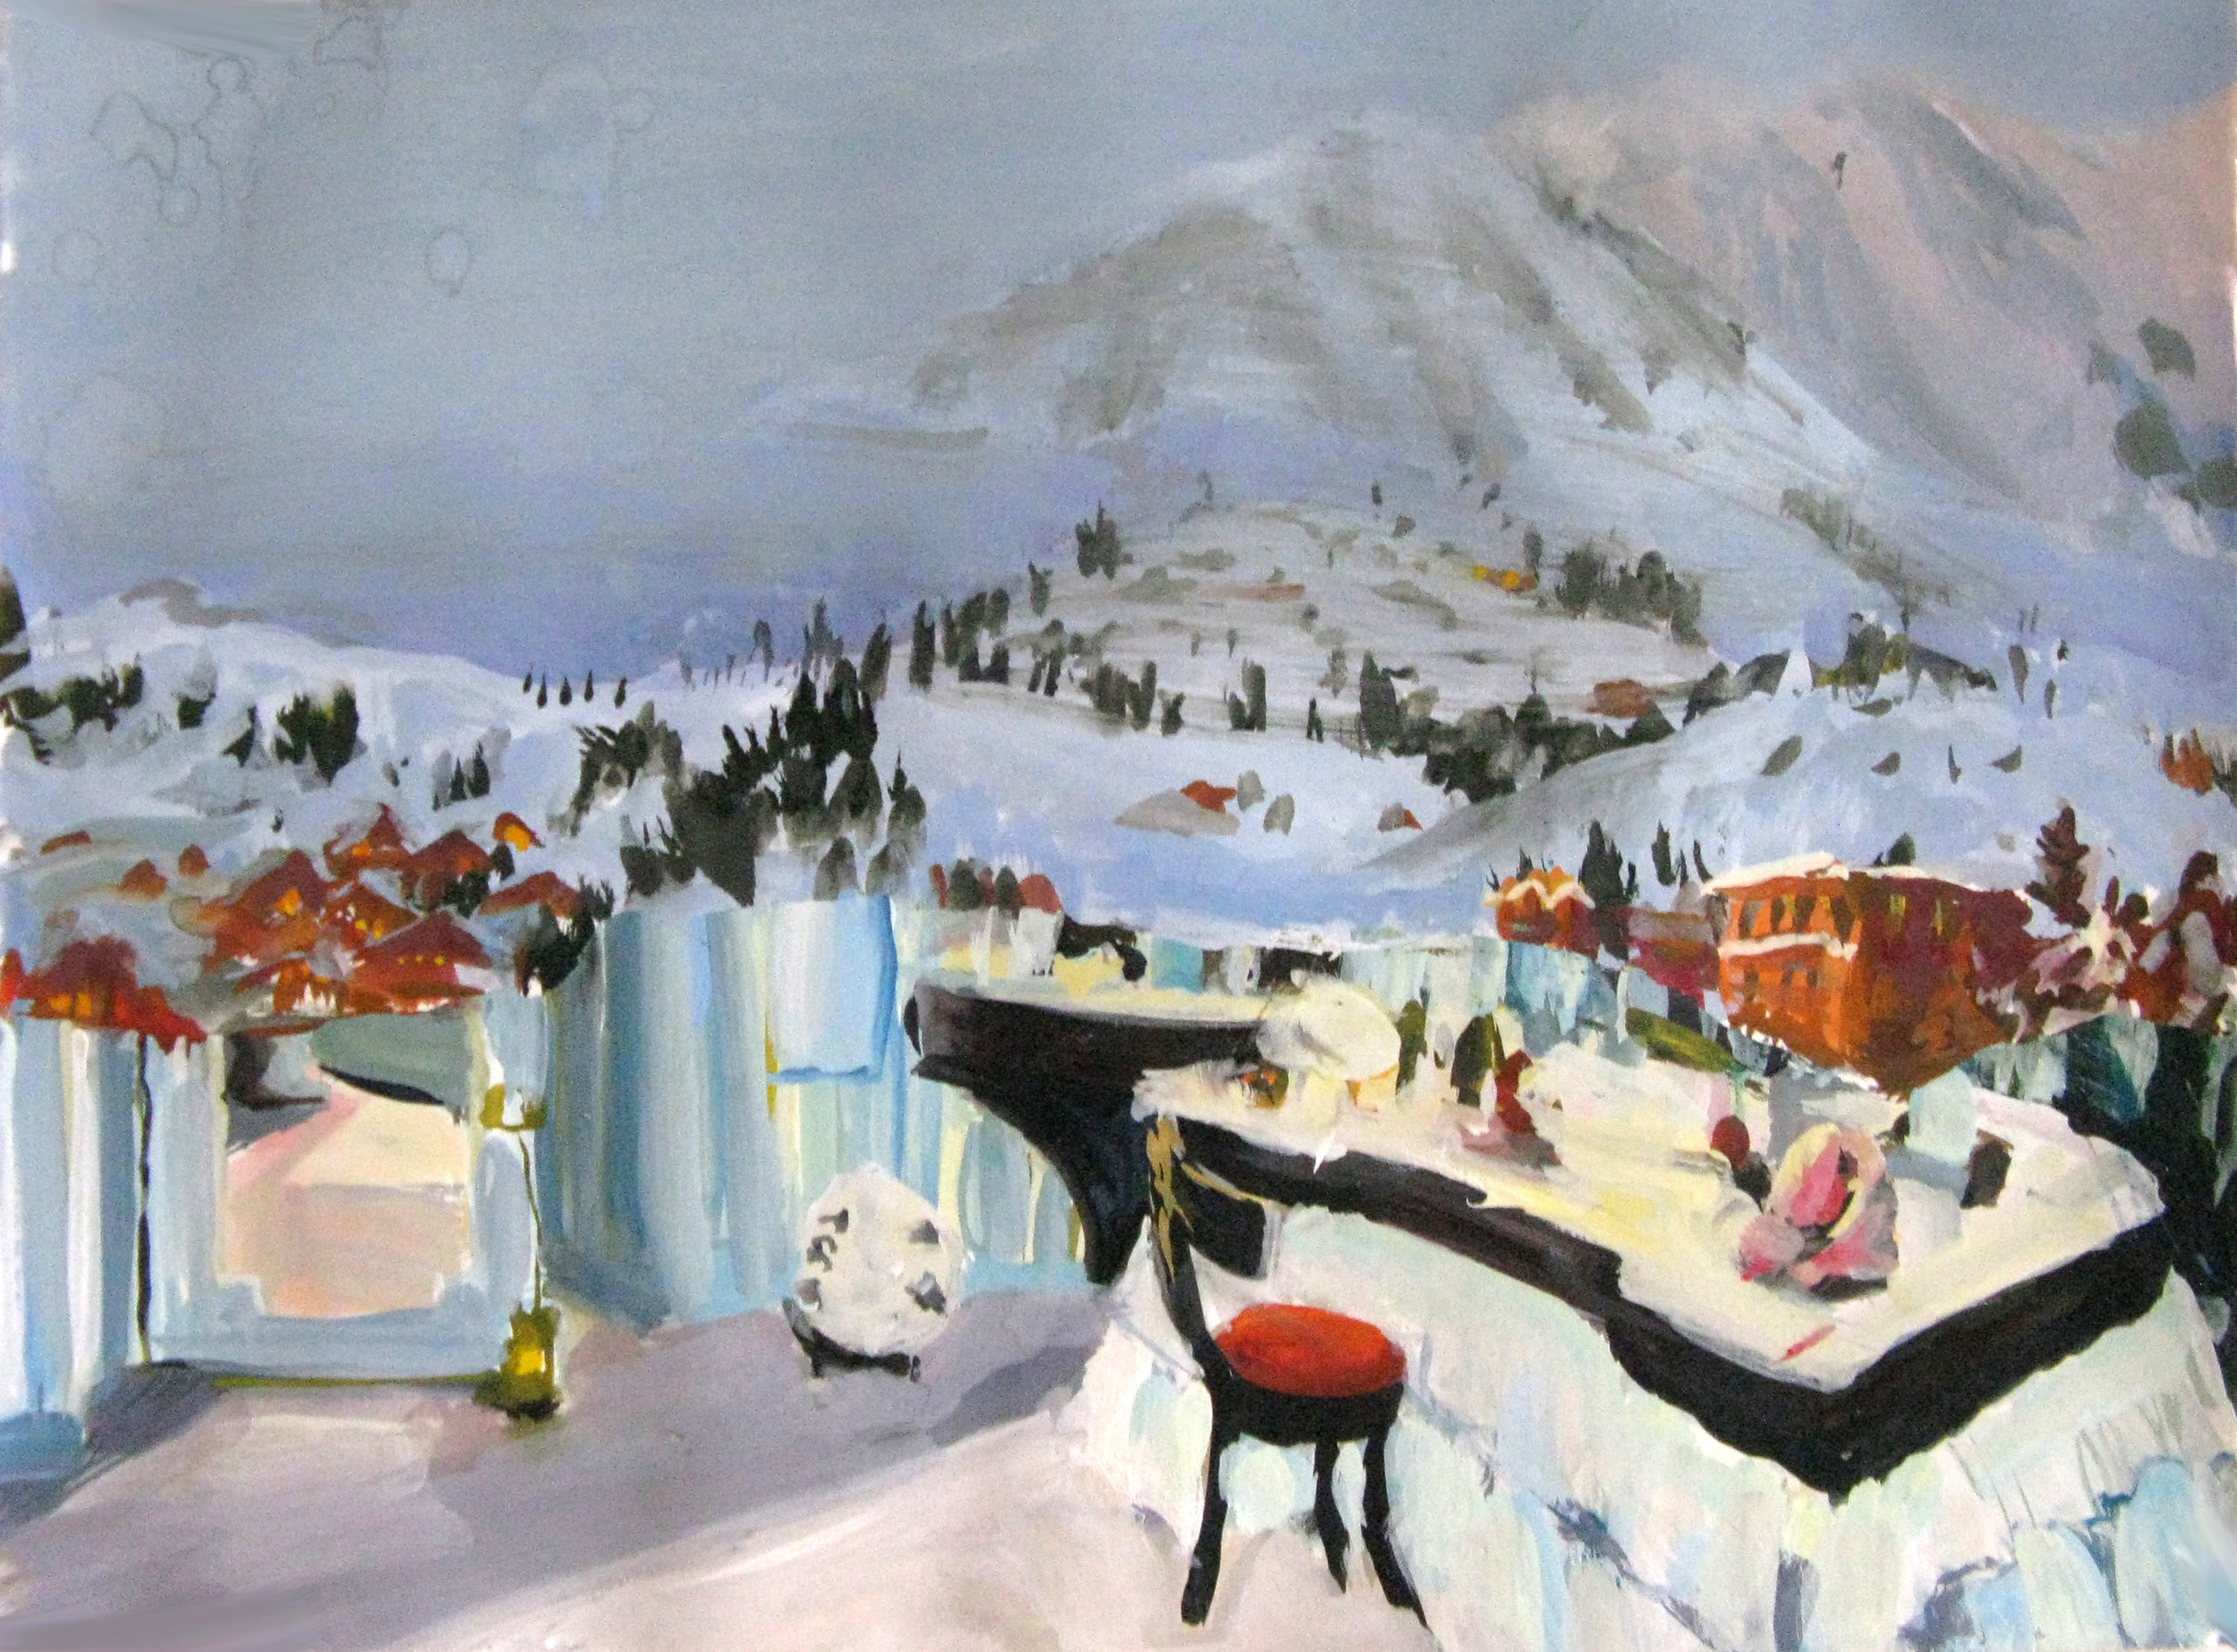 "Mountain Resort 11"" x 15"" gouache & watercolor"